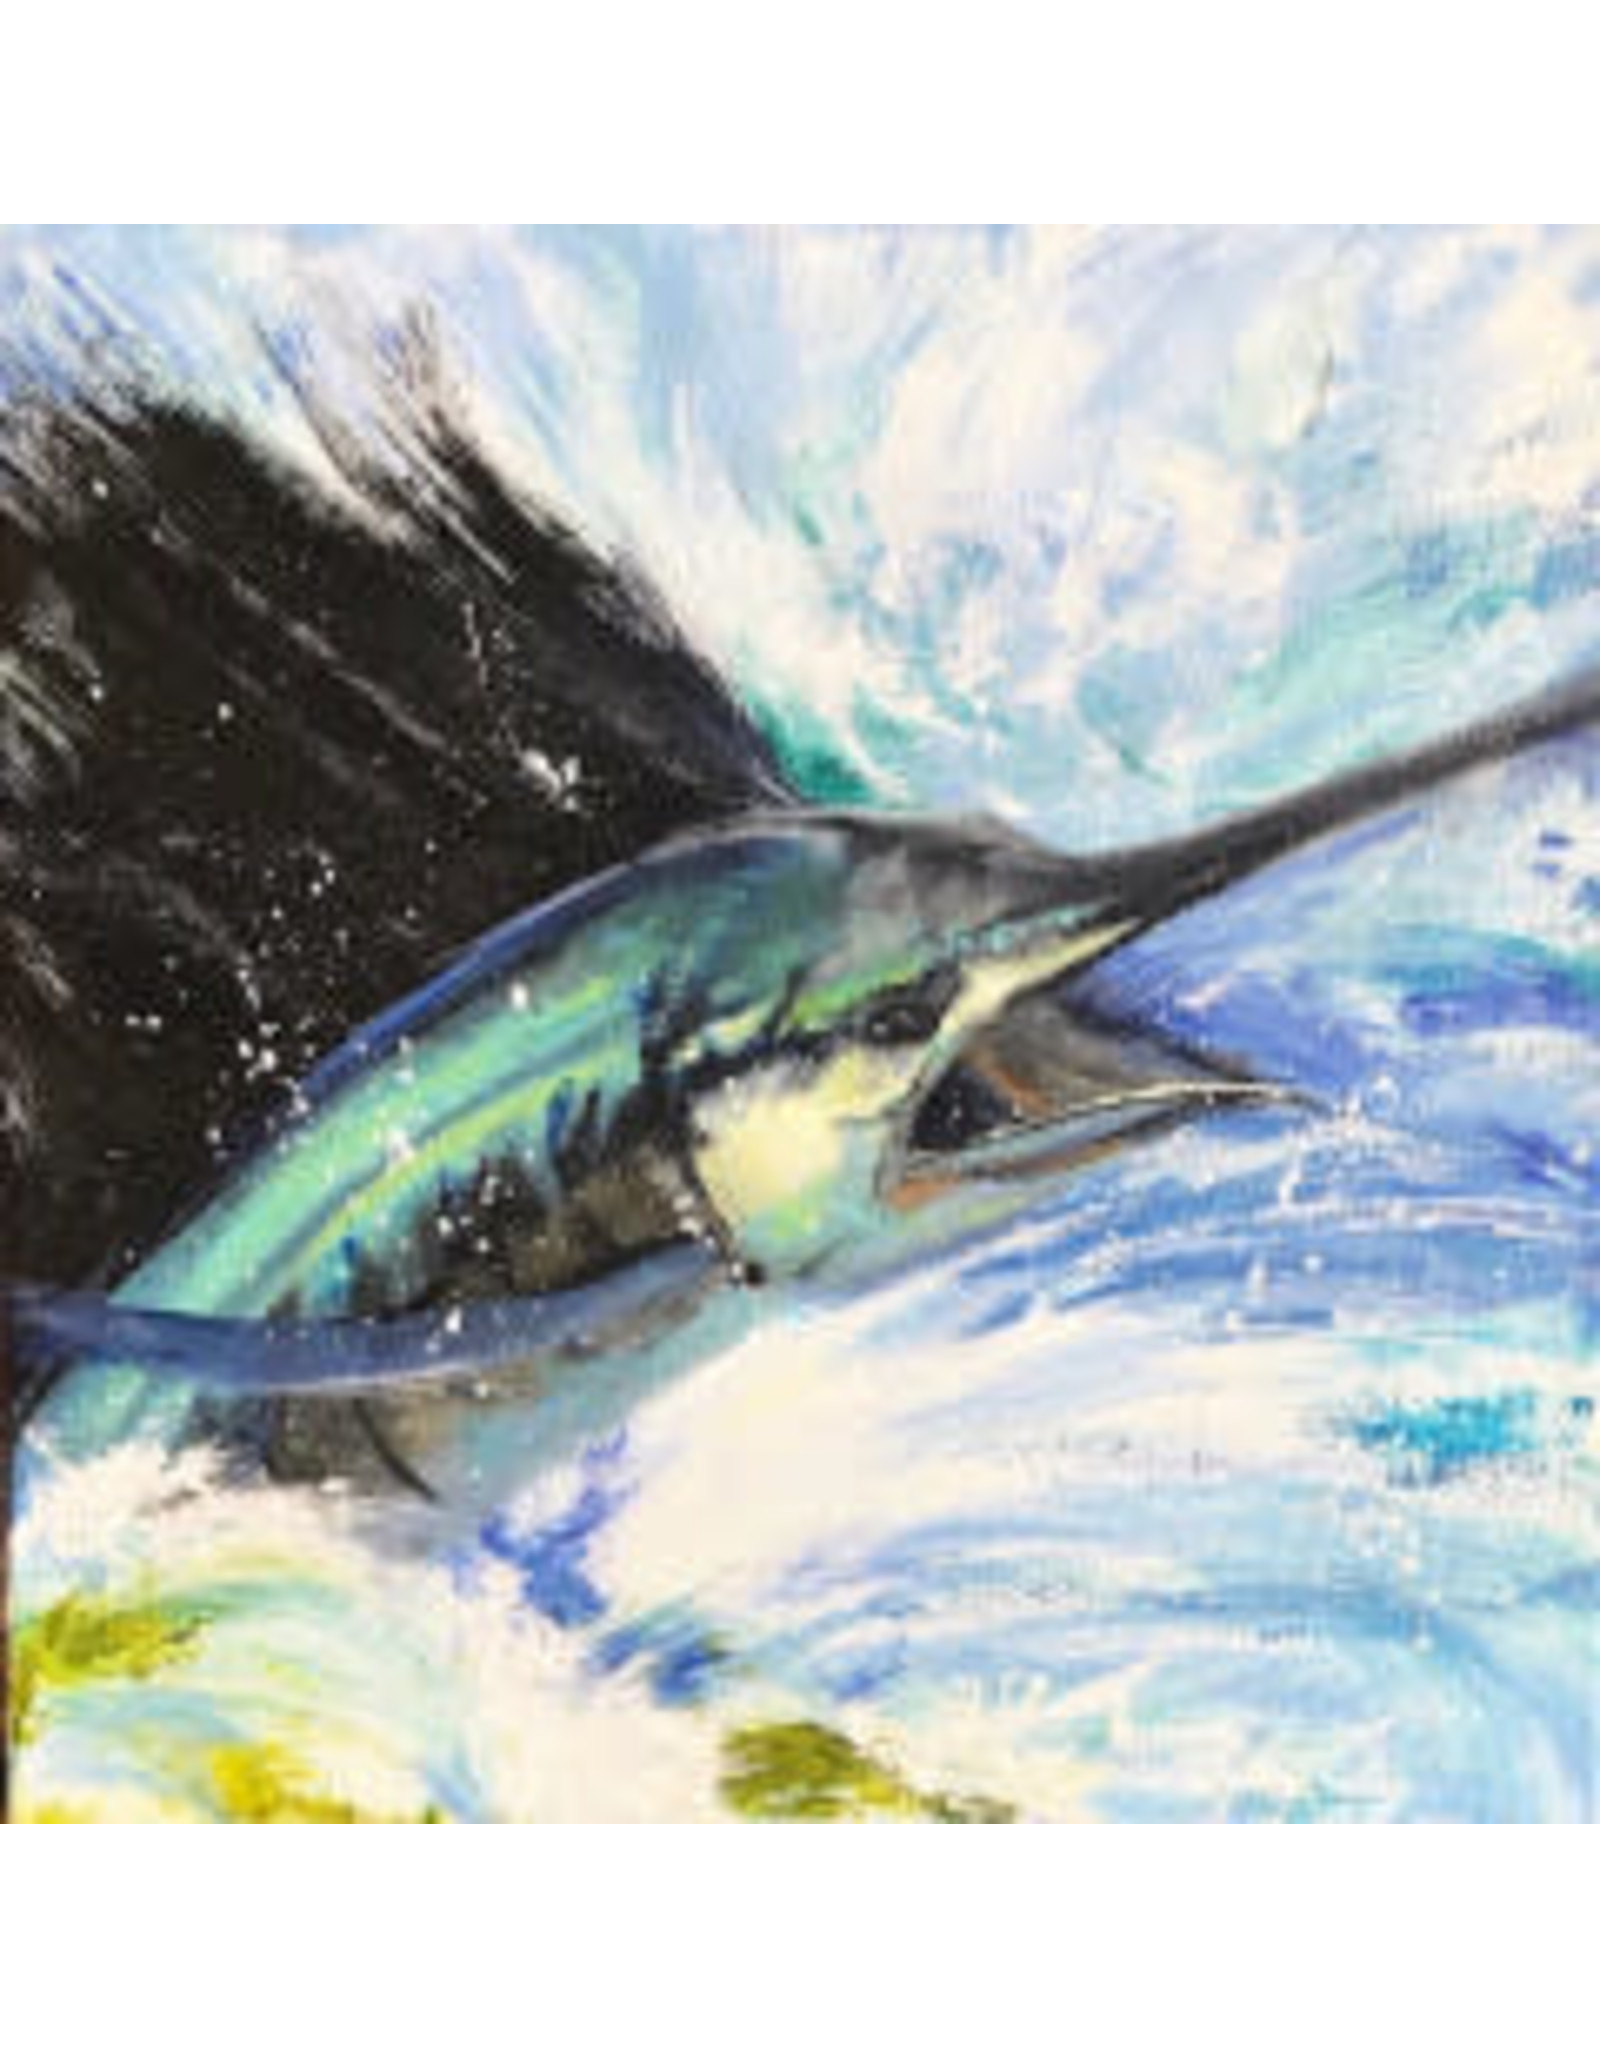 "Michaelann Bellerjeau Sailfish 1 giclee print on paper, 11x11"" MICB)"